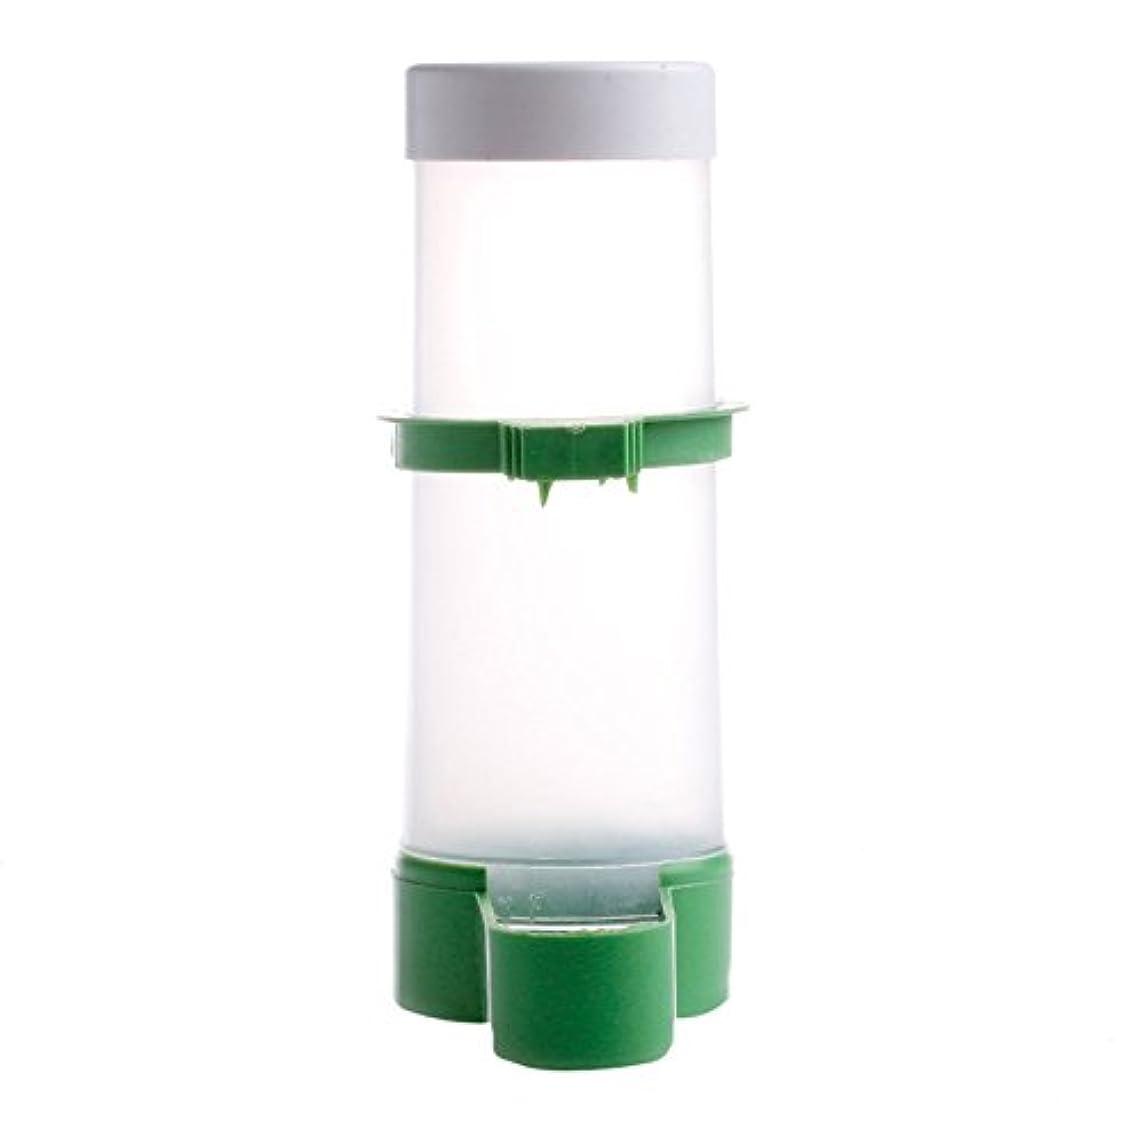 Bird Feeding - Plastic Automatic Drinker Feeder Water Clip Cockatiel Lovebird Bird Farming Equipment Pet - Tube Bowls Feeders Bucket Ball Feeding Syringe Nest Post Blocks Proof Table Accessor